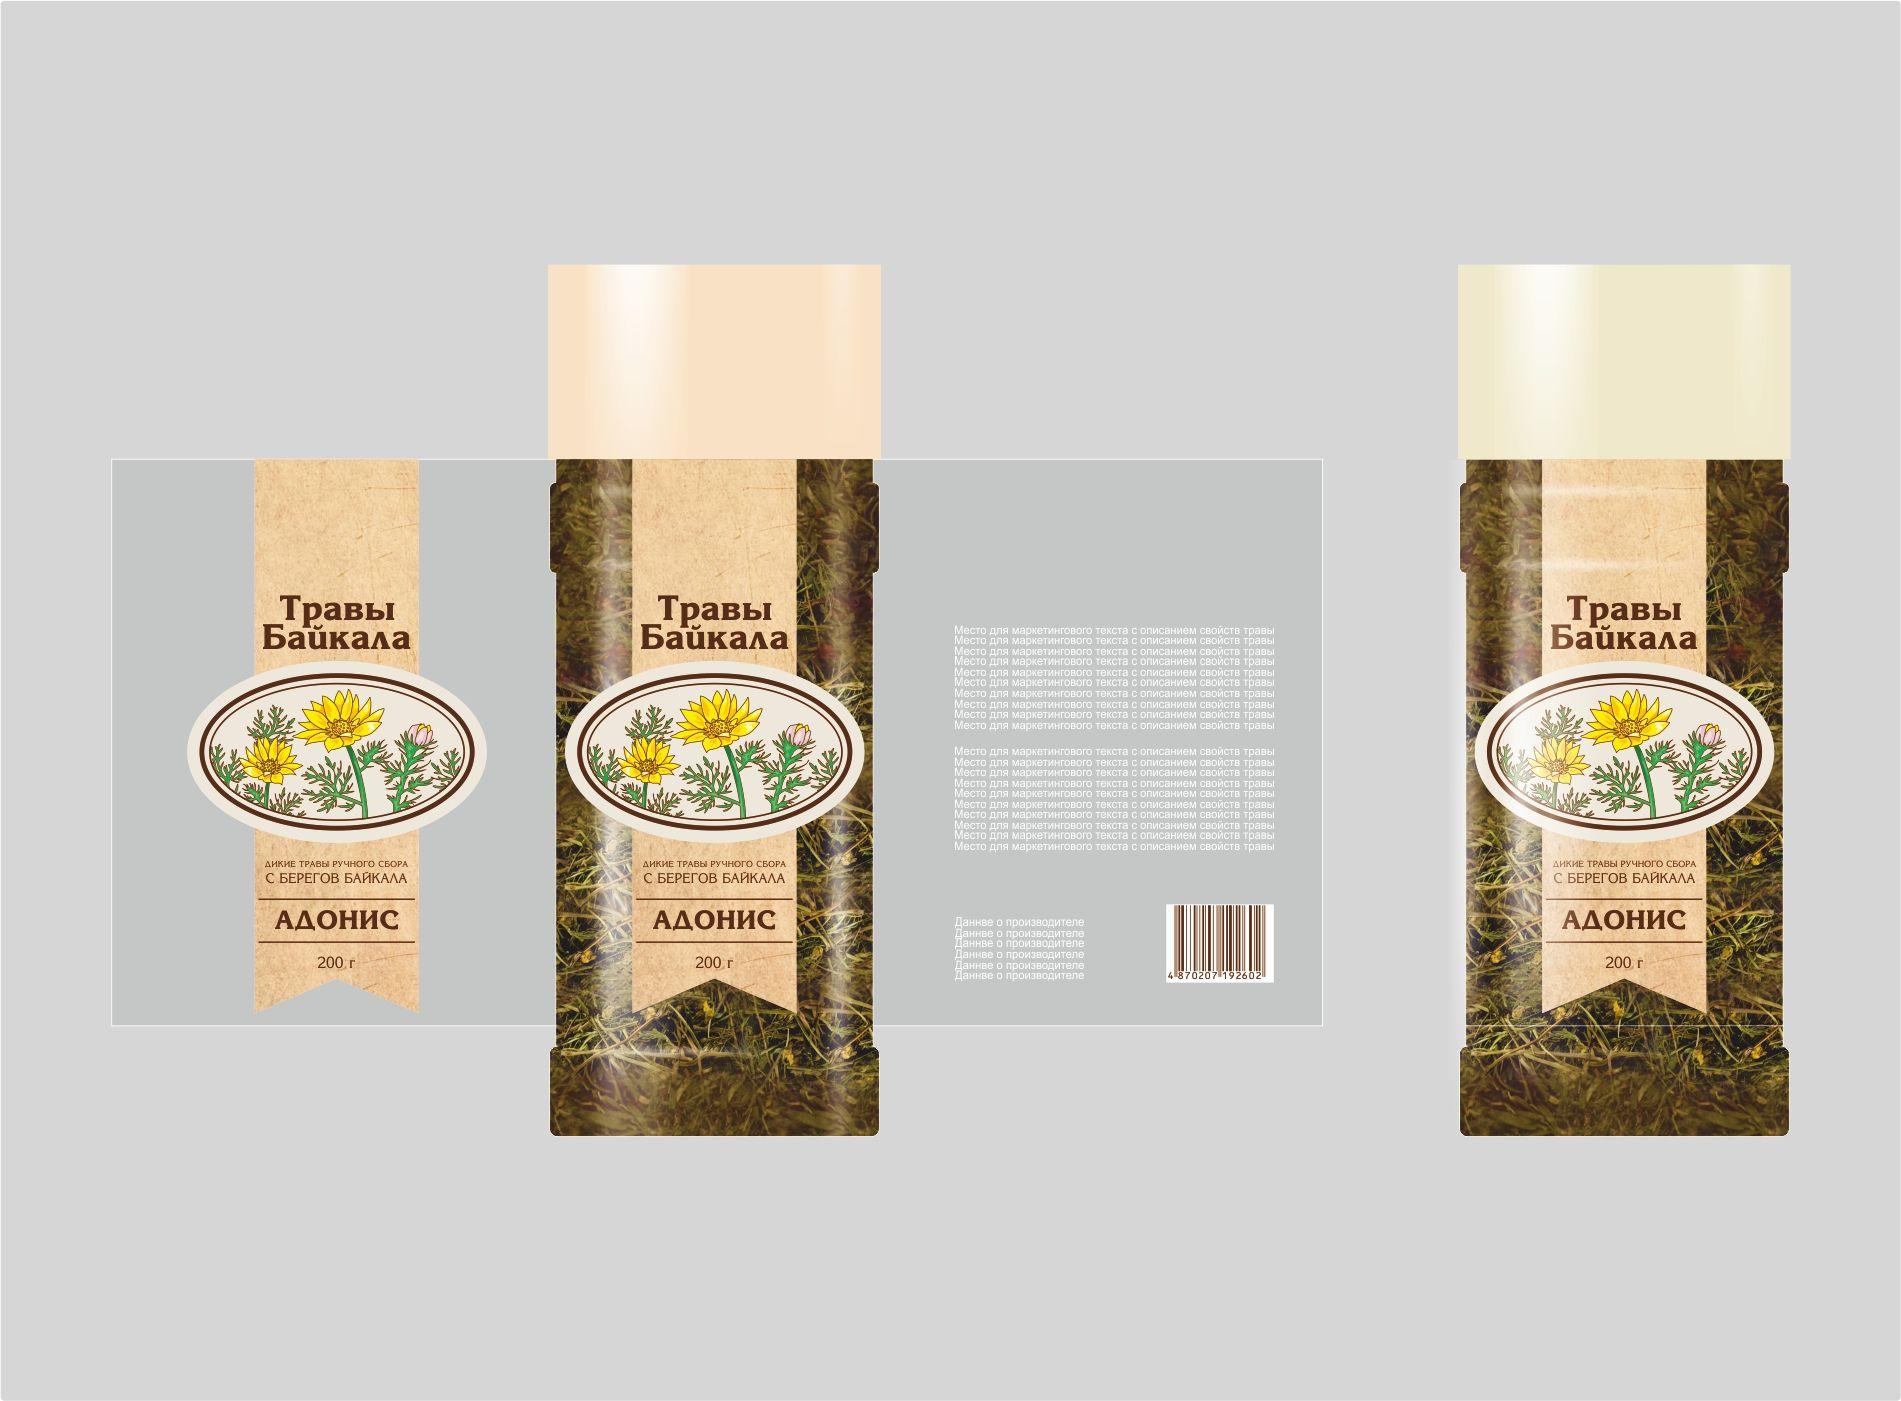 Травы Байкала - дизайнер kolchinviktor